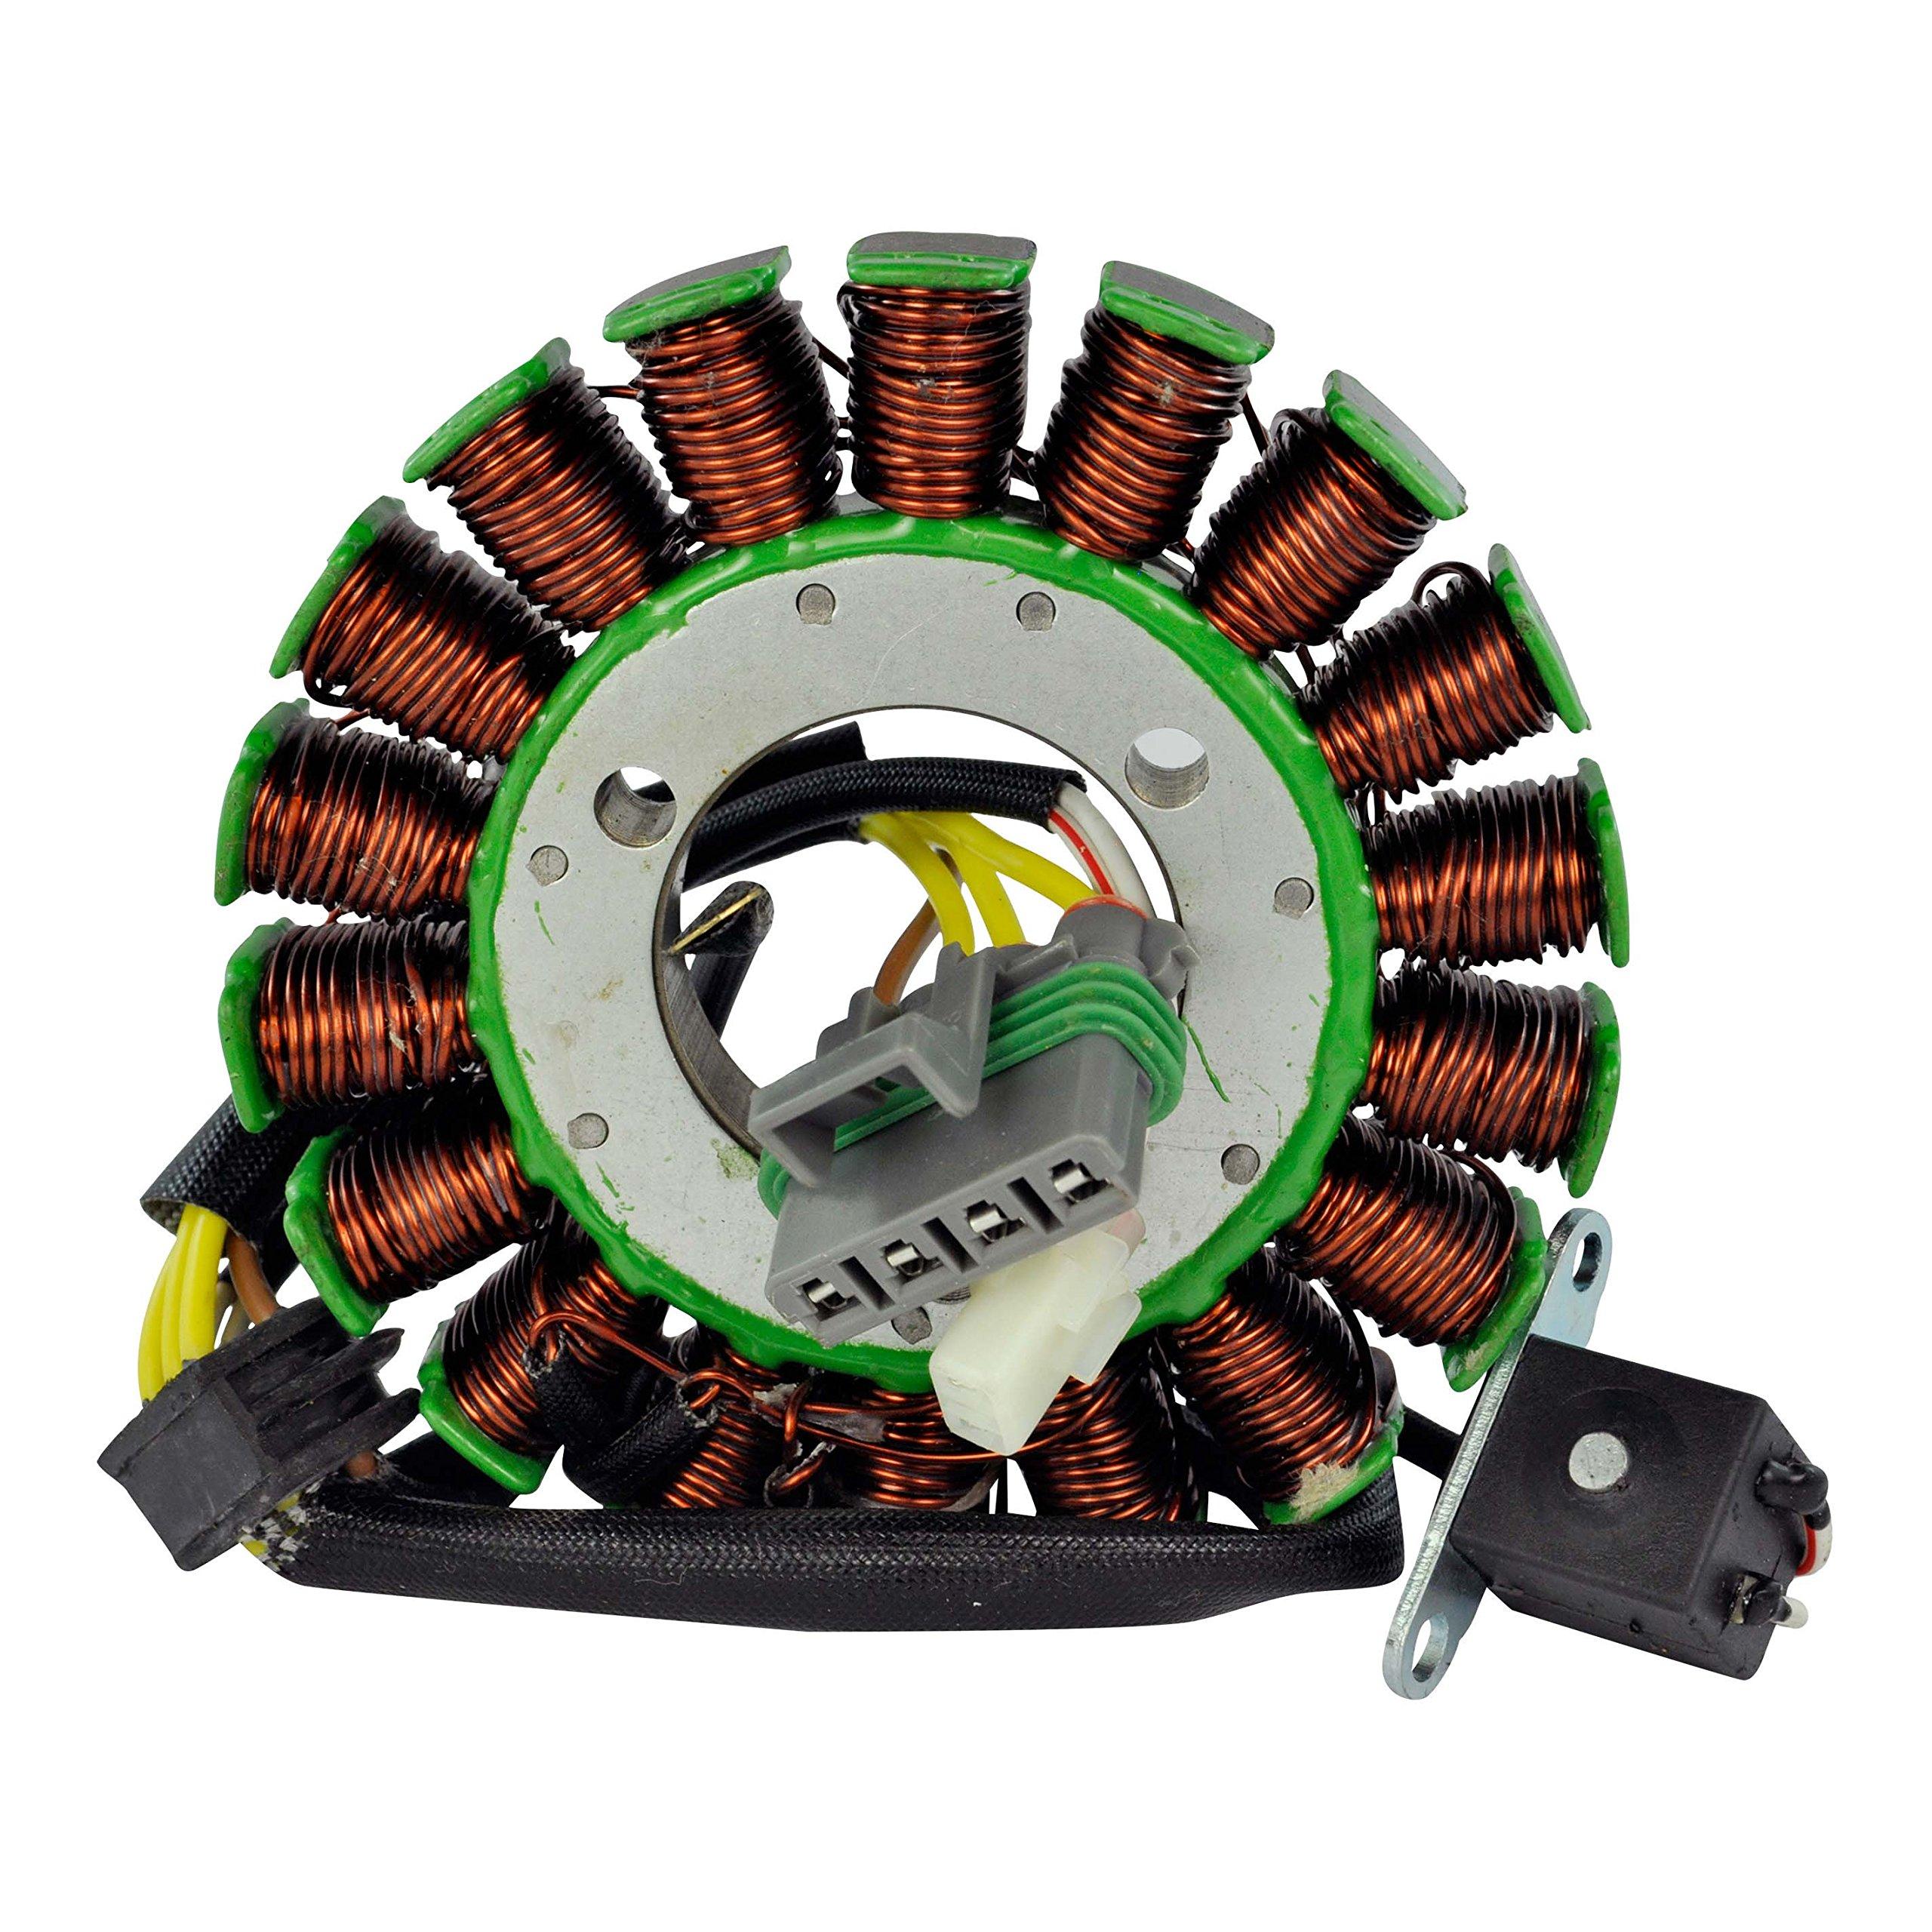 Generator Stator For Polaris Ranger 500/Crew 500 Sportsman 500/HO/X2 500 2005-2014 OEM Repl.# 3089906 3089959 3089579 3090081 by RMSTATOR